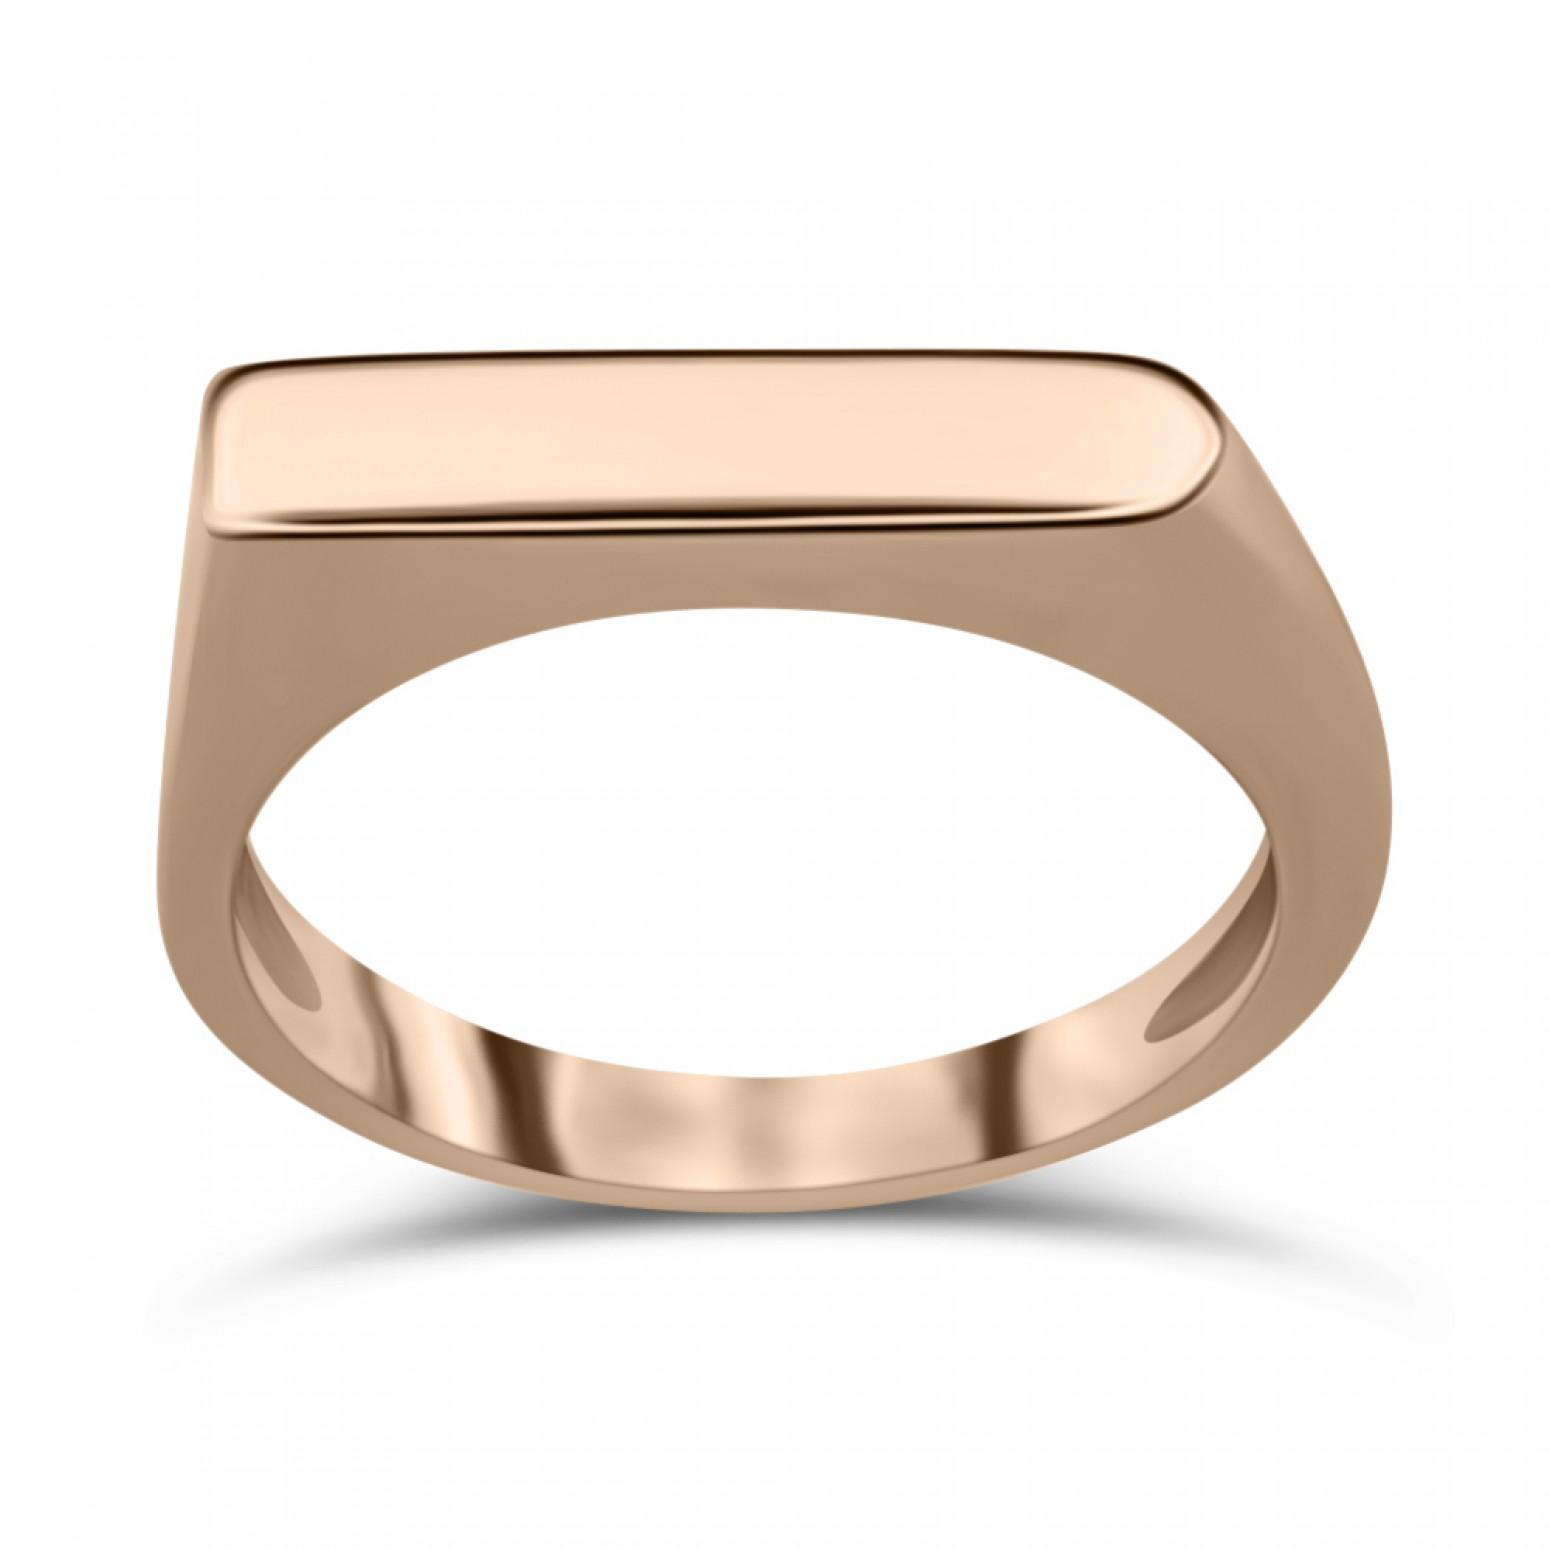 Ring K9 pink gold, da3473 RINGS Κοσμηματα - chrilia.gr